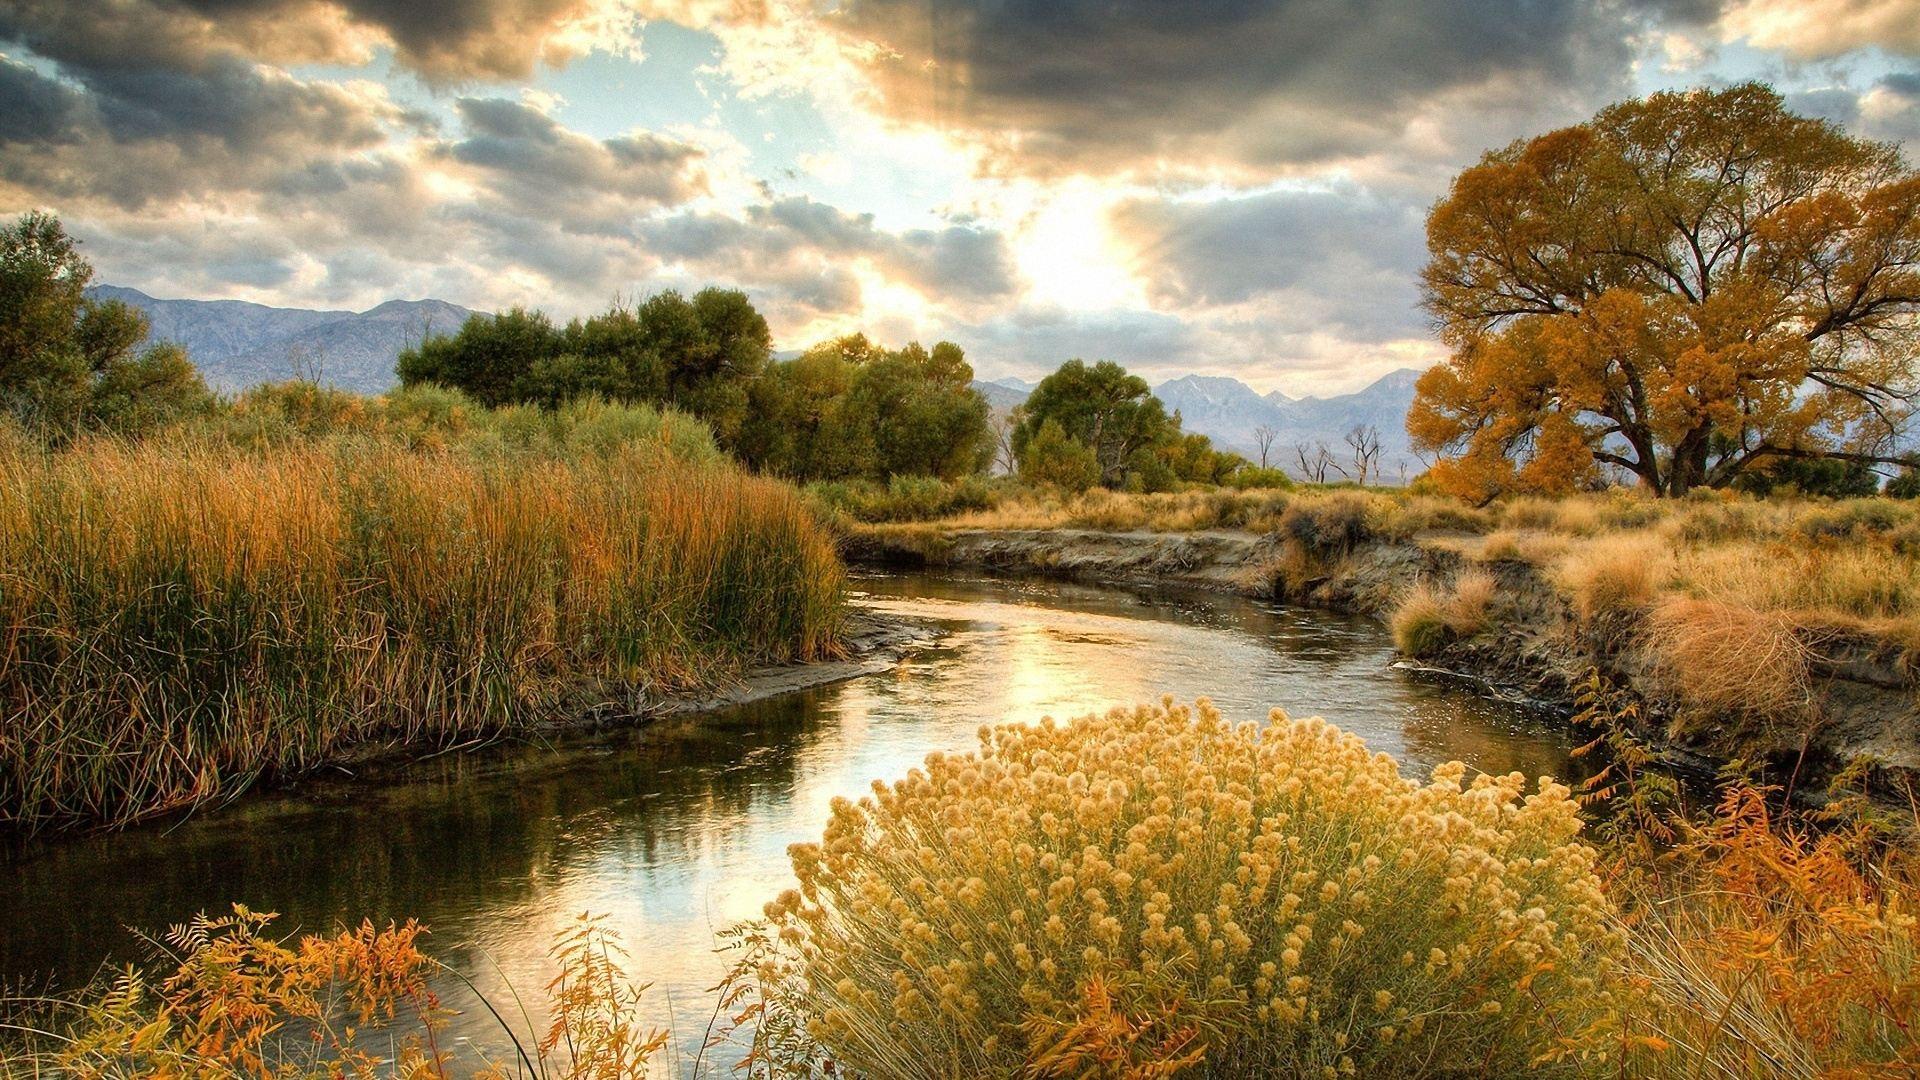 Autumn Scenery Full HD Desktop Wallpapers 1080p 1920x1080